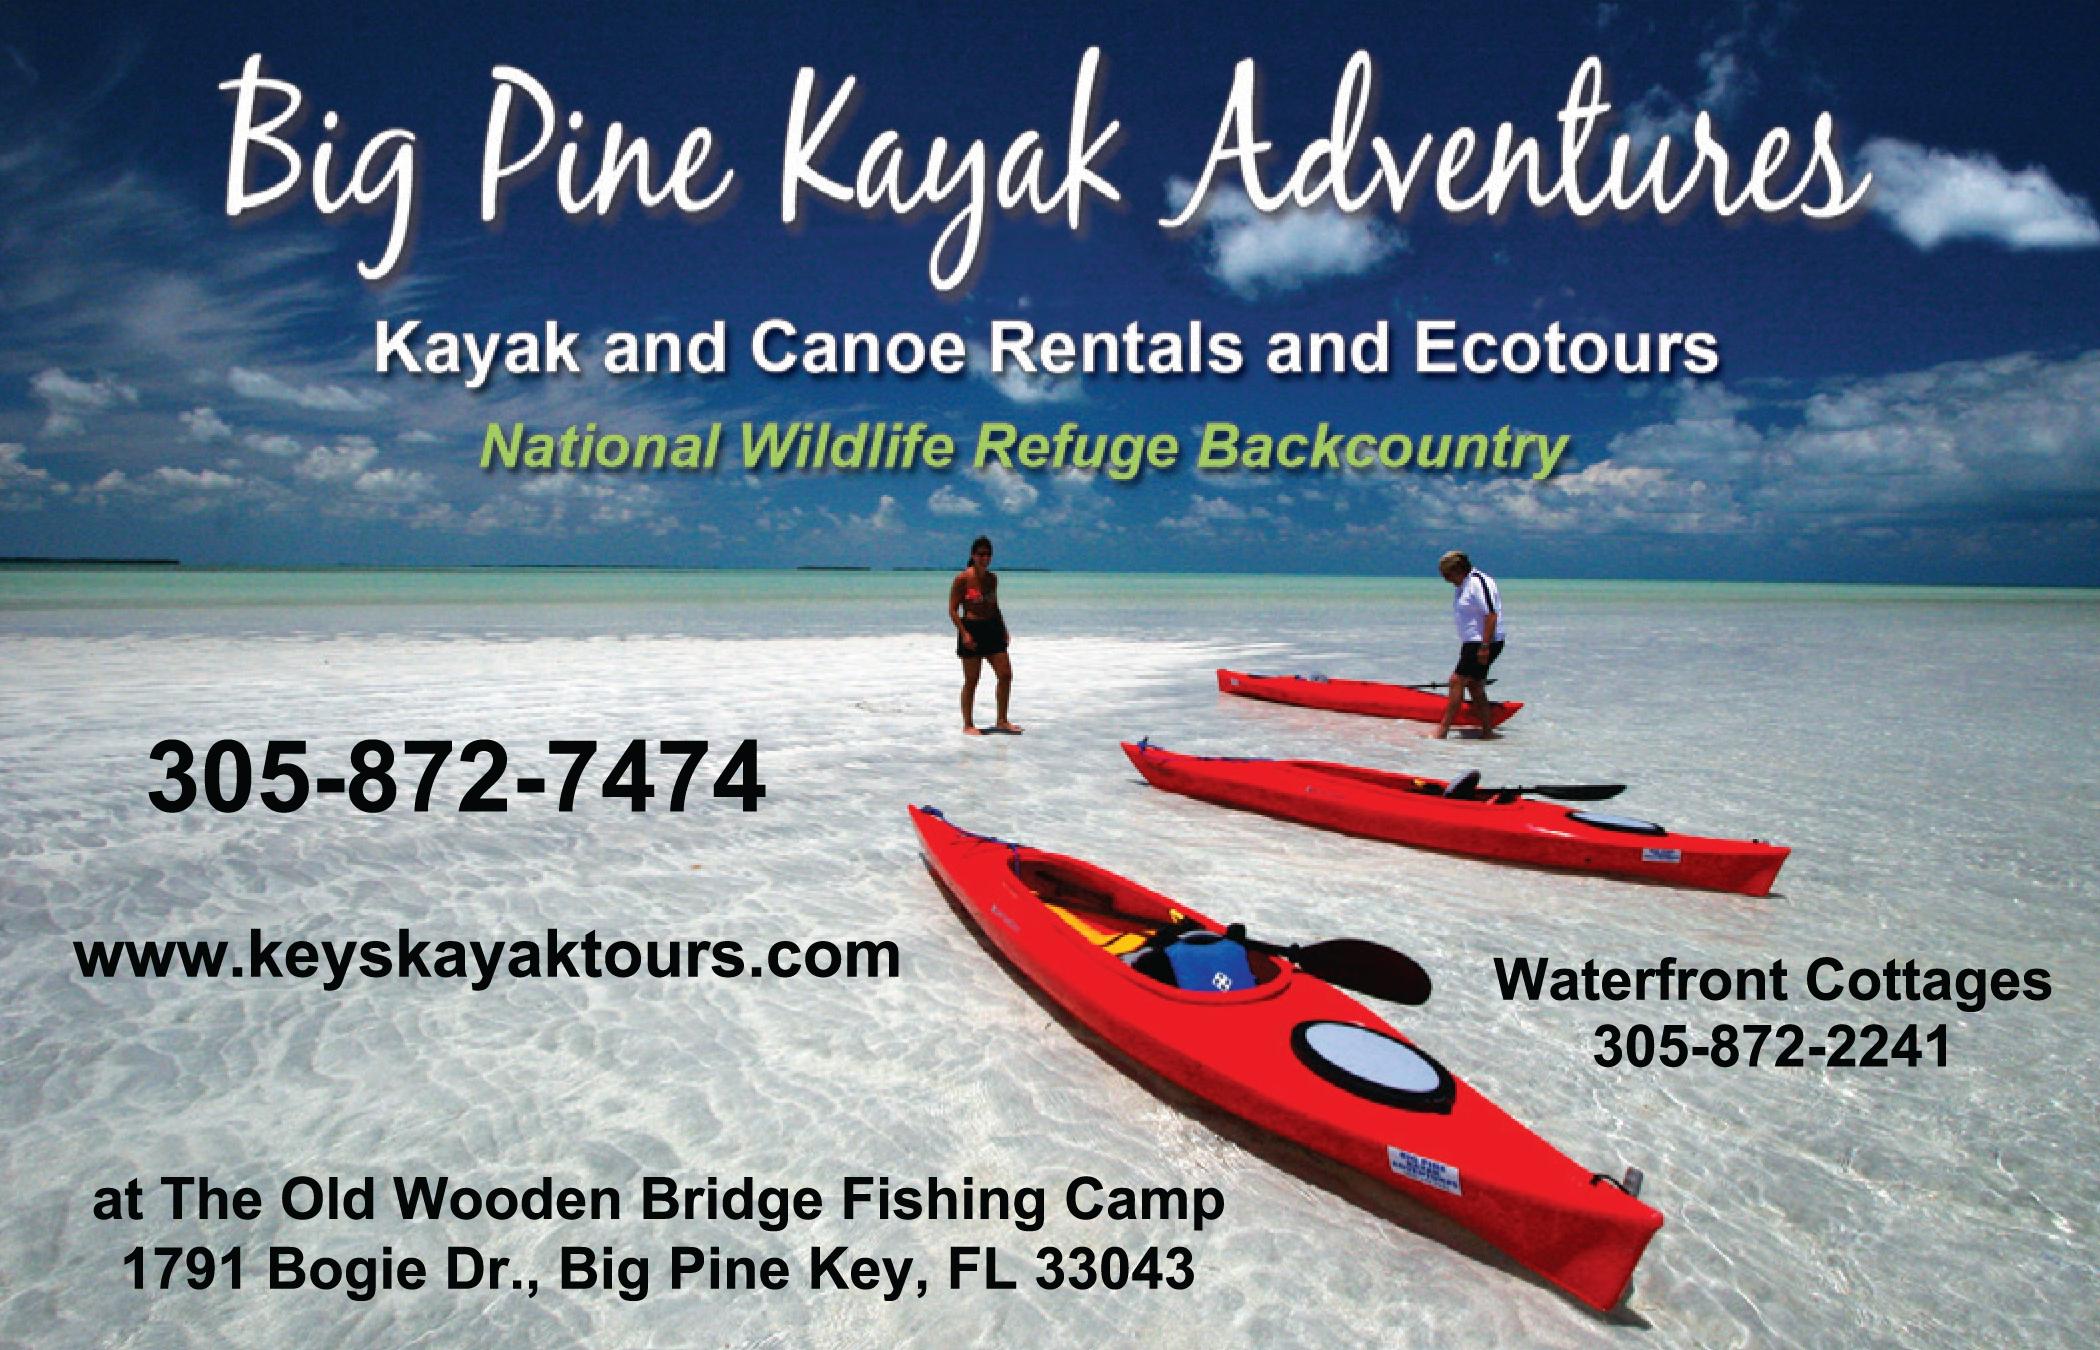 Big Pine Kayak Adventures